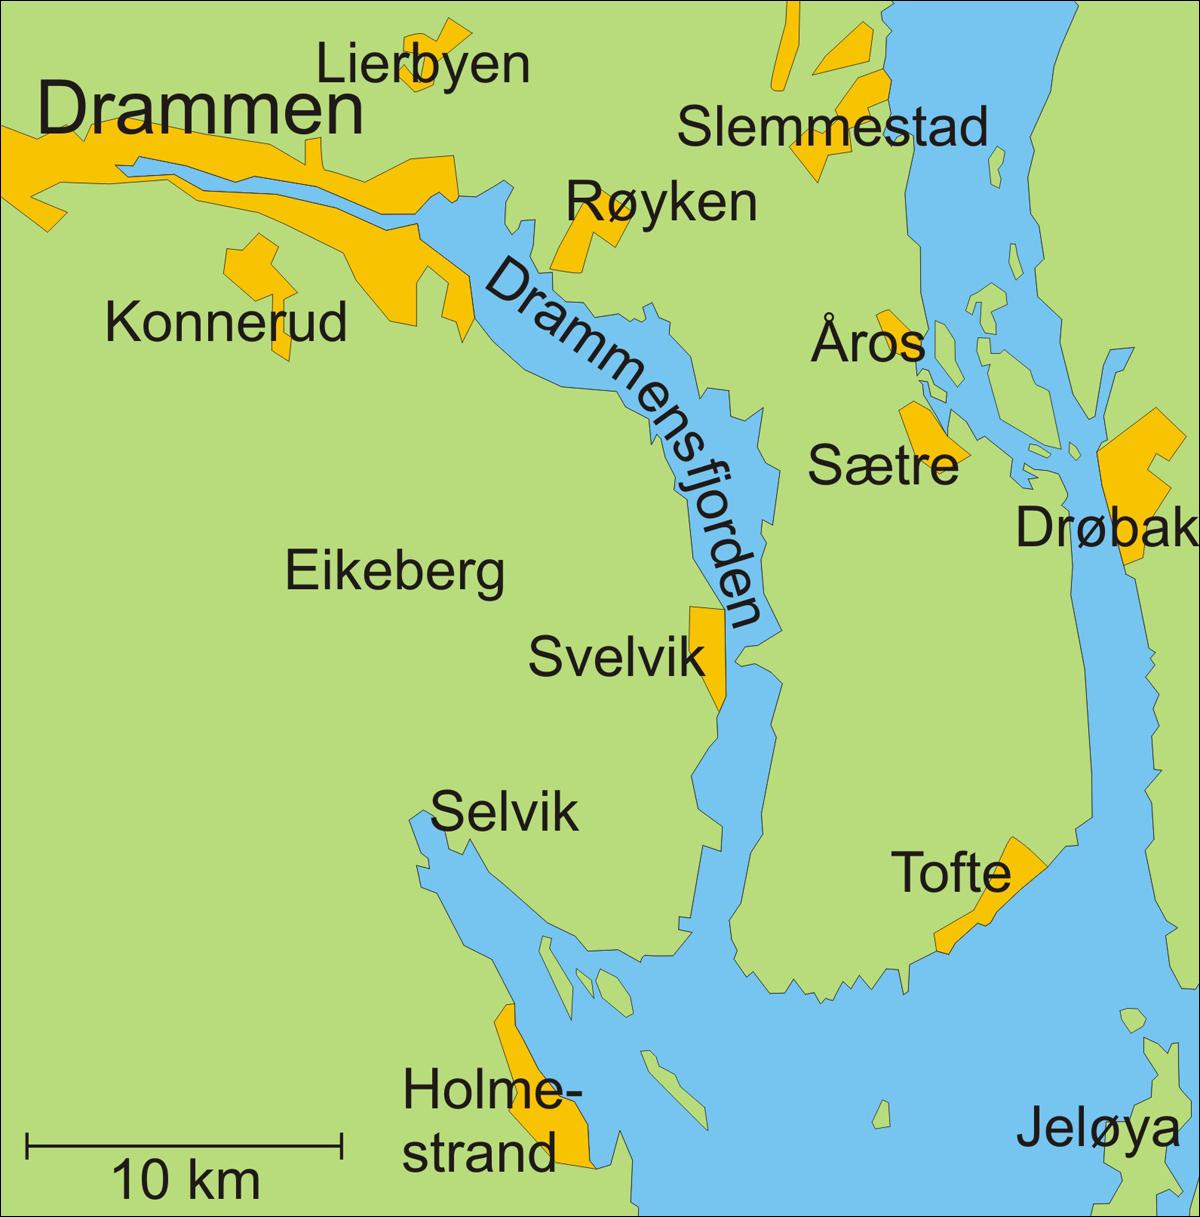 hurumlandet kart Hurumlandet – Wikipedia hurumlandet kart